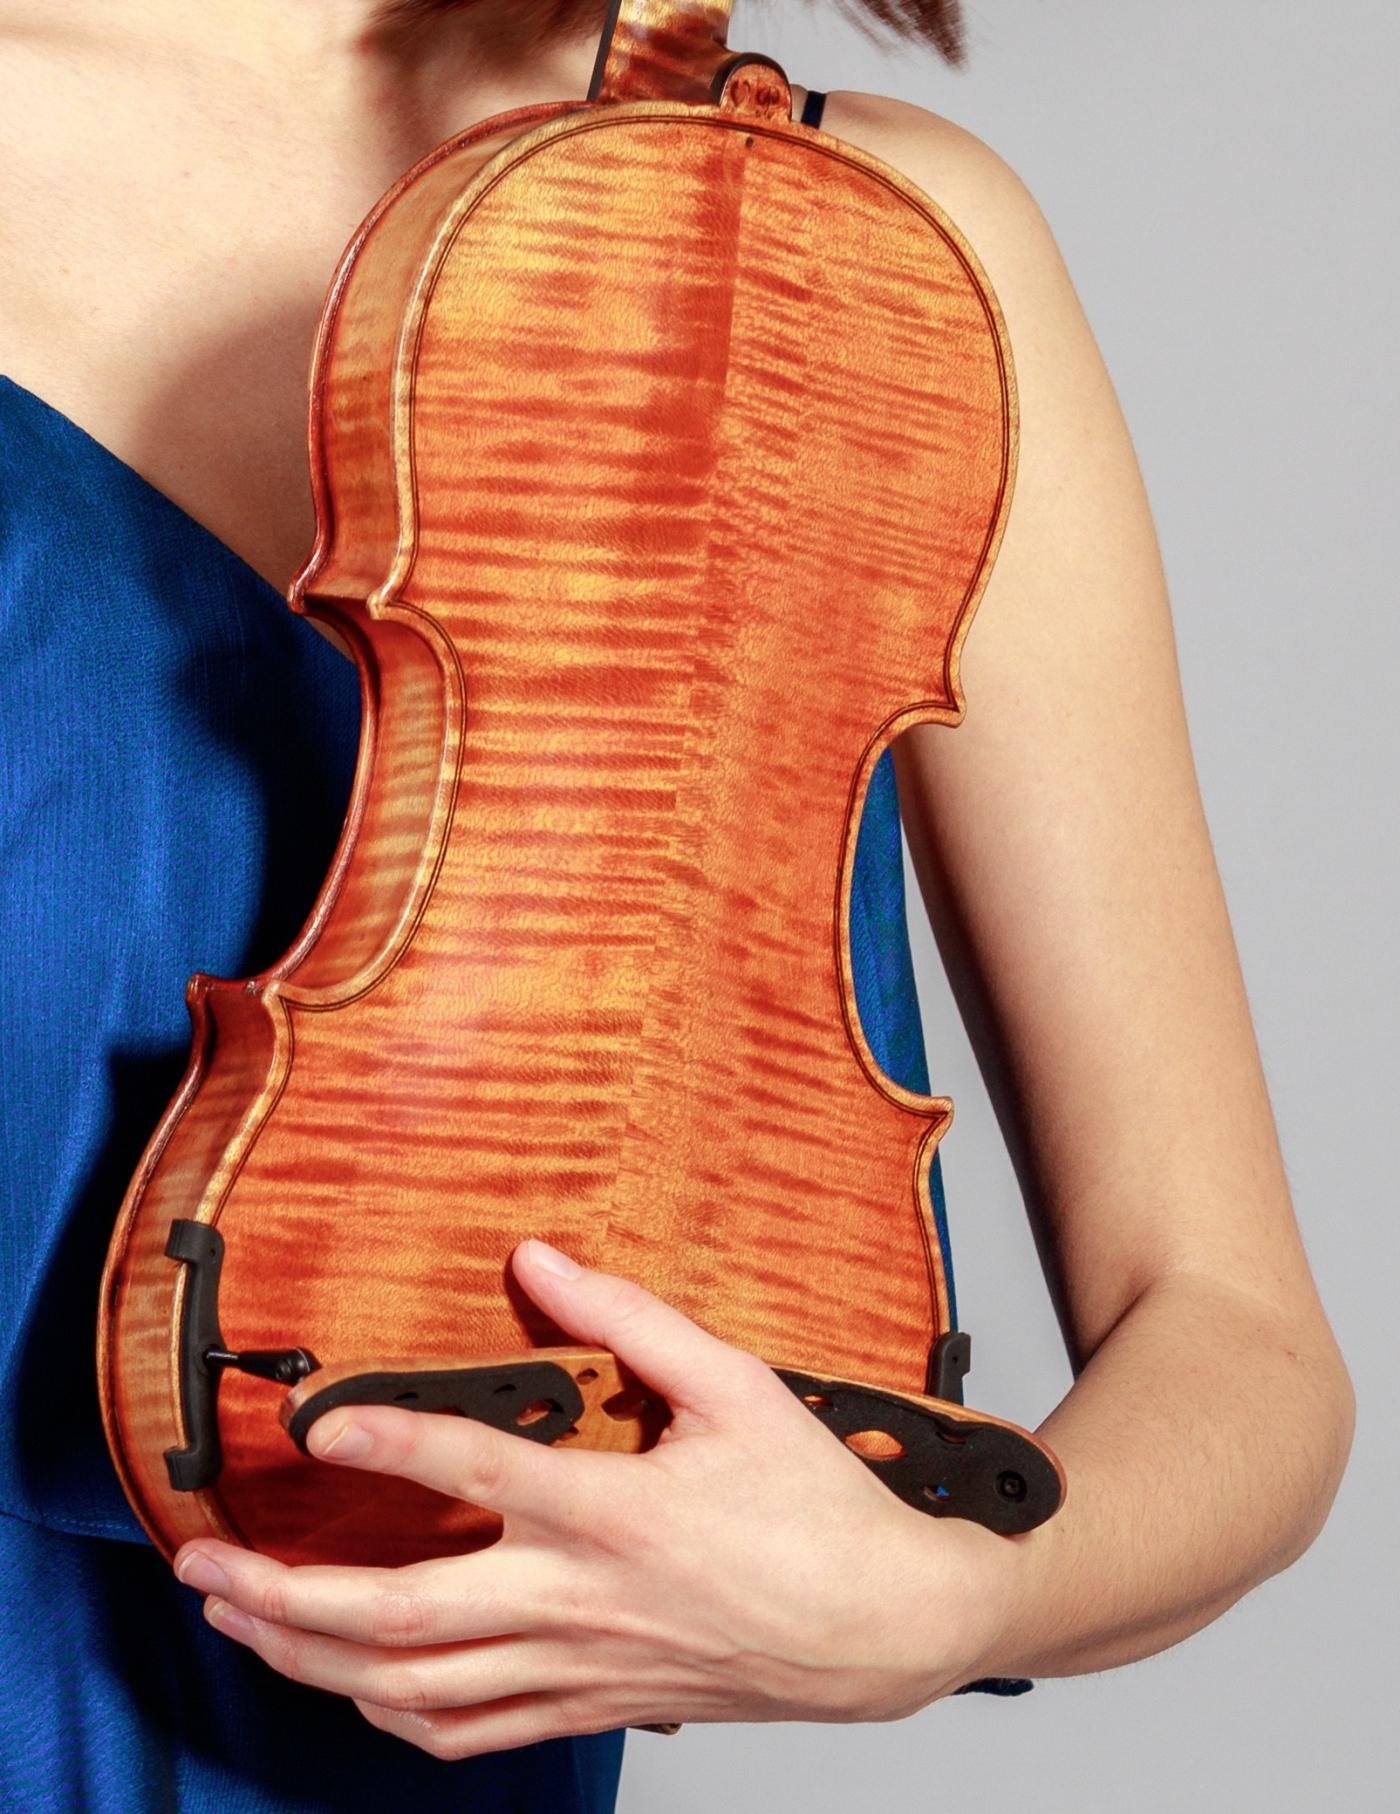 Junge Frau hält eine Violine im Arm